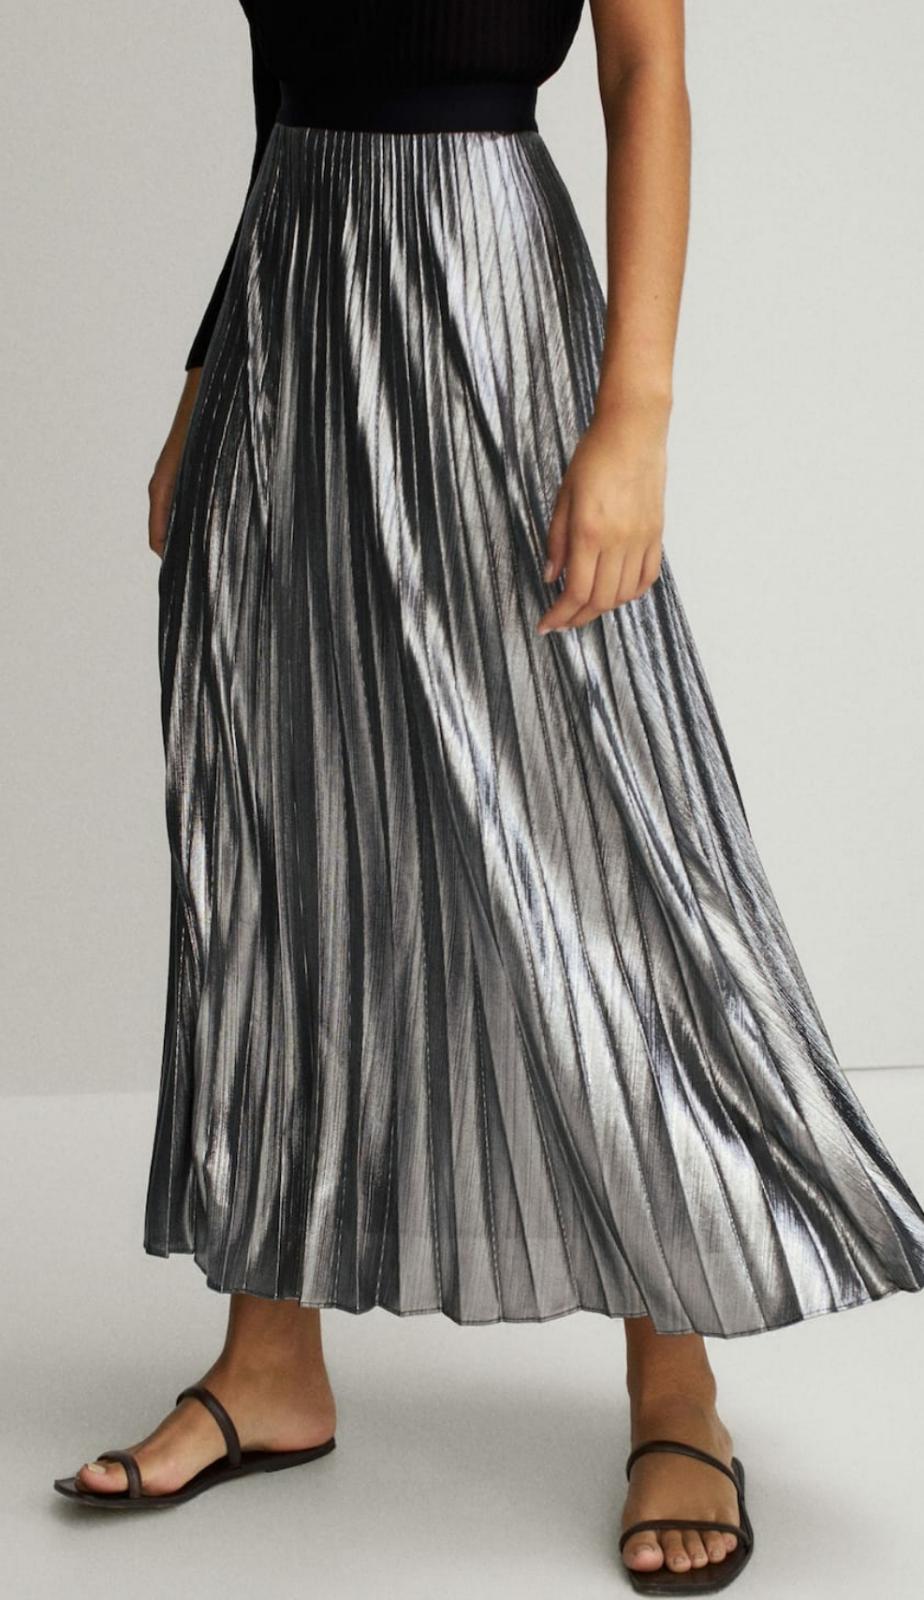 Falda plisada laminada en color plata de Massimo Dutti 19'95€